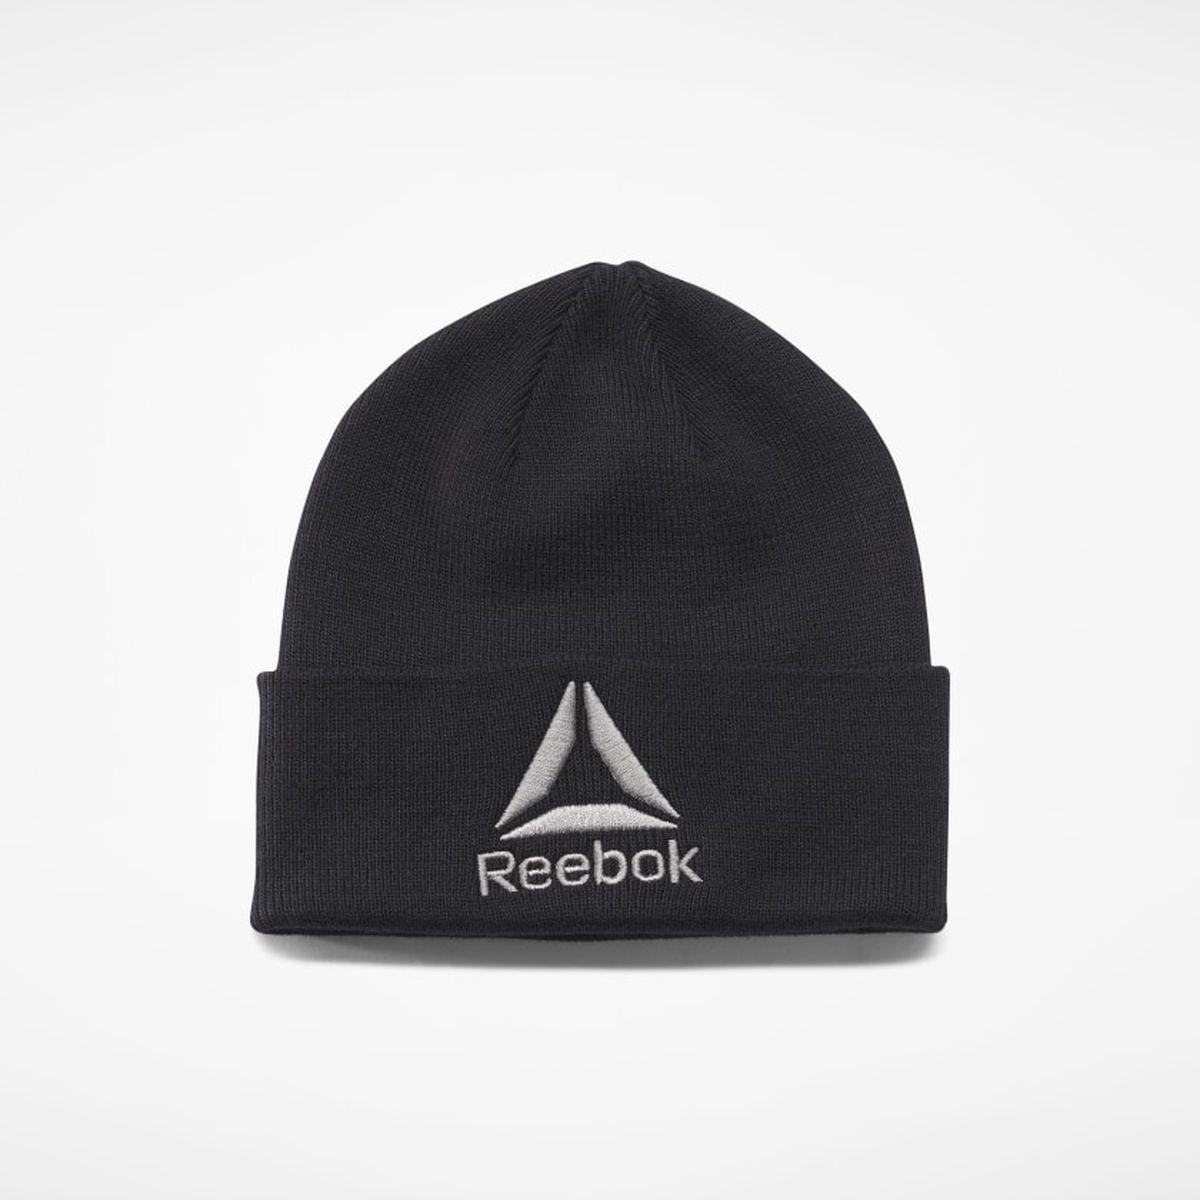 Фото - Шапка Reebok Ost Perf Beanie шапка adidas perf beanie цвет синий dj1055 размер 56 57